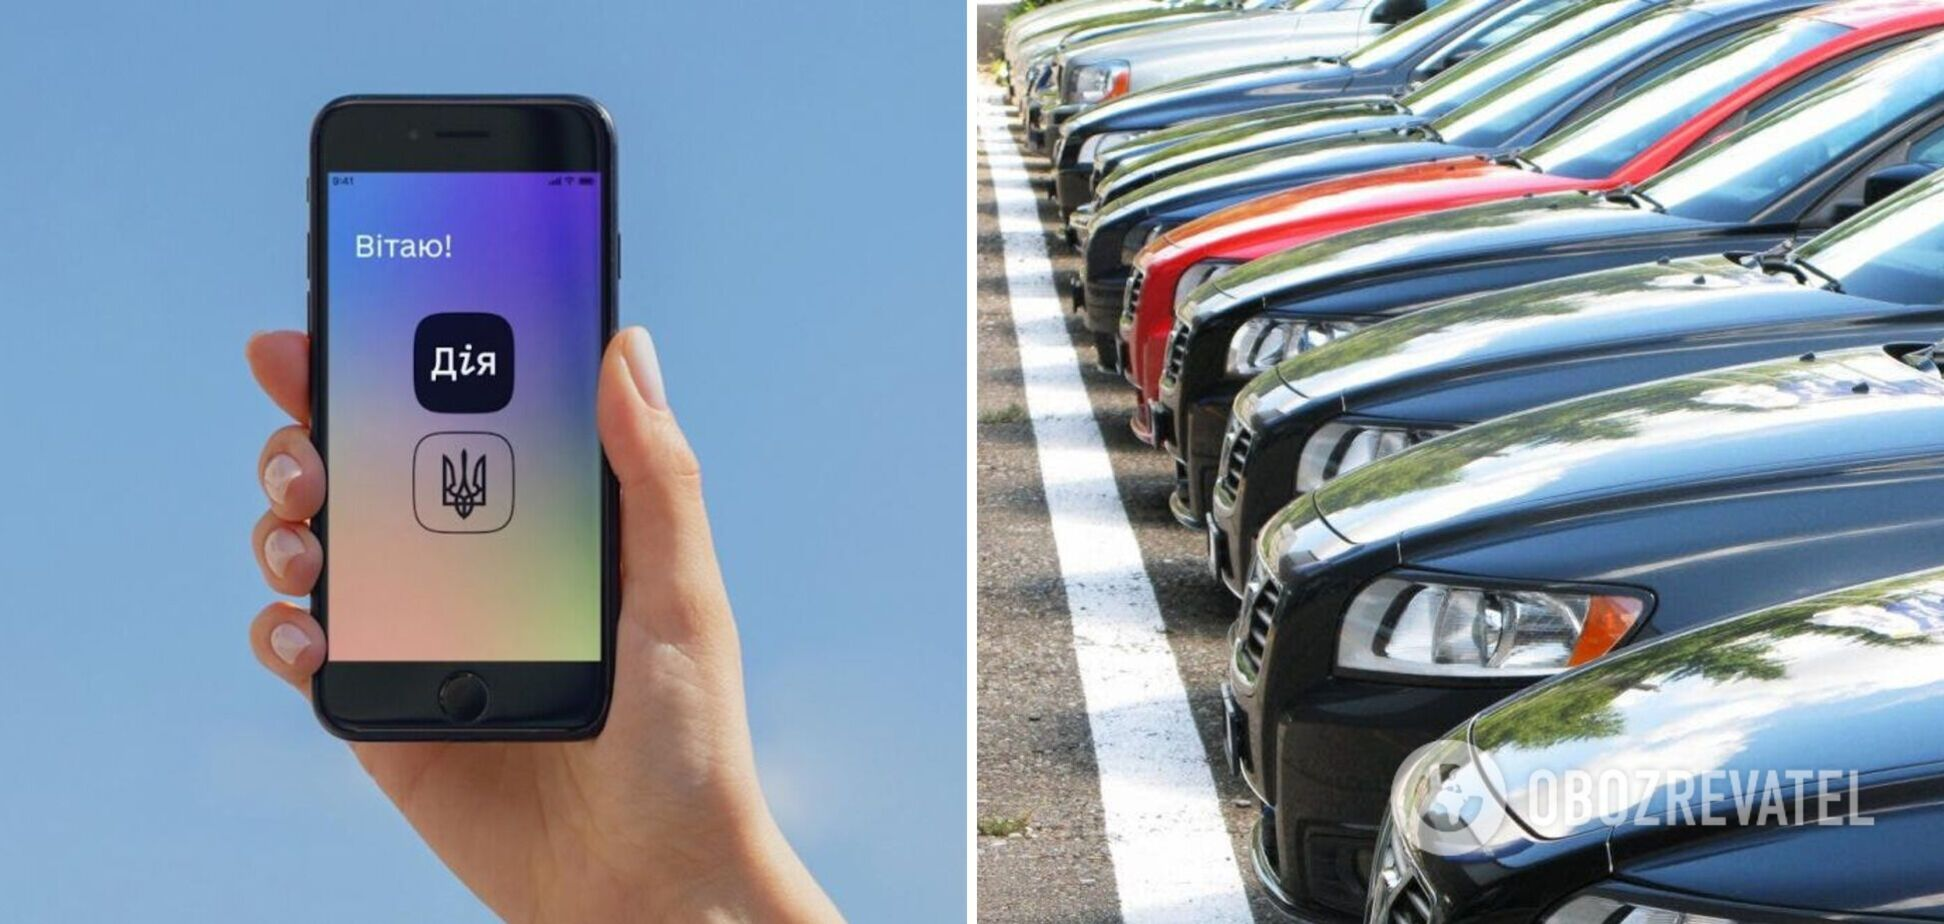 В Украине хотят ввести растаможку авто в Дії